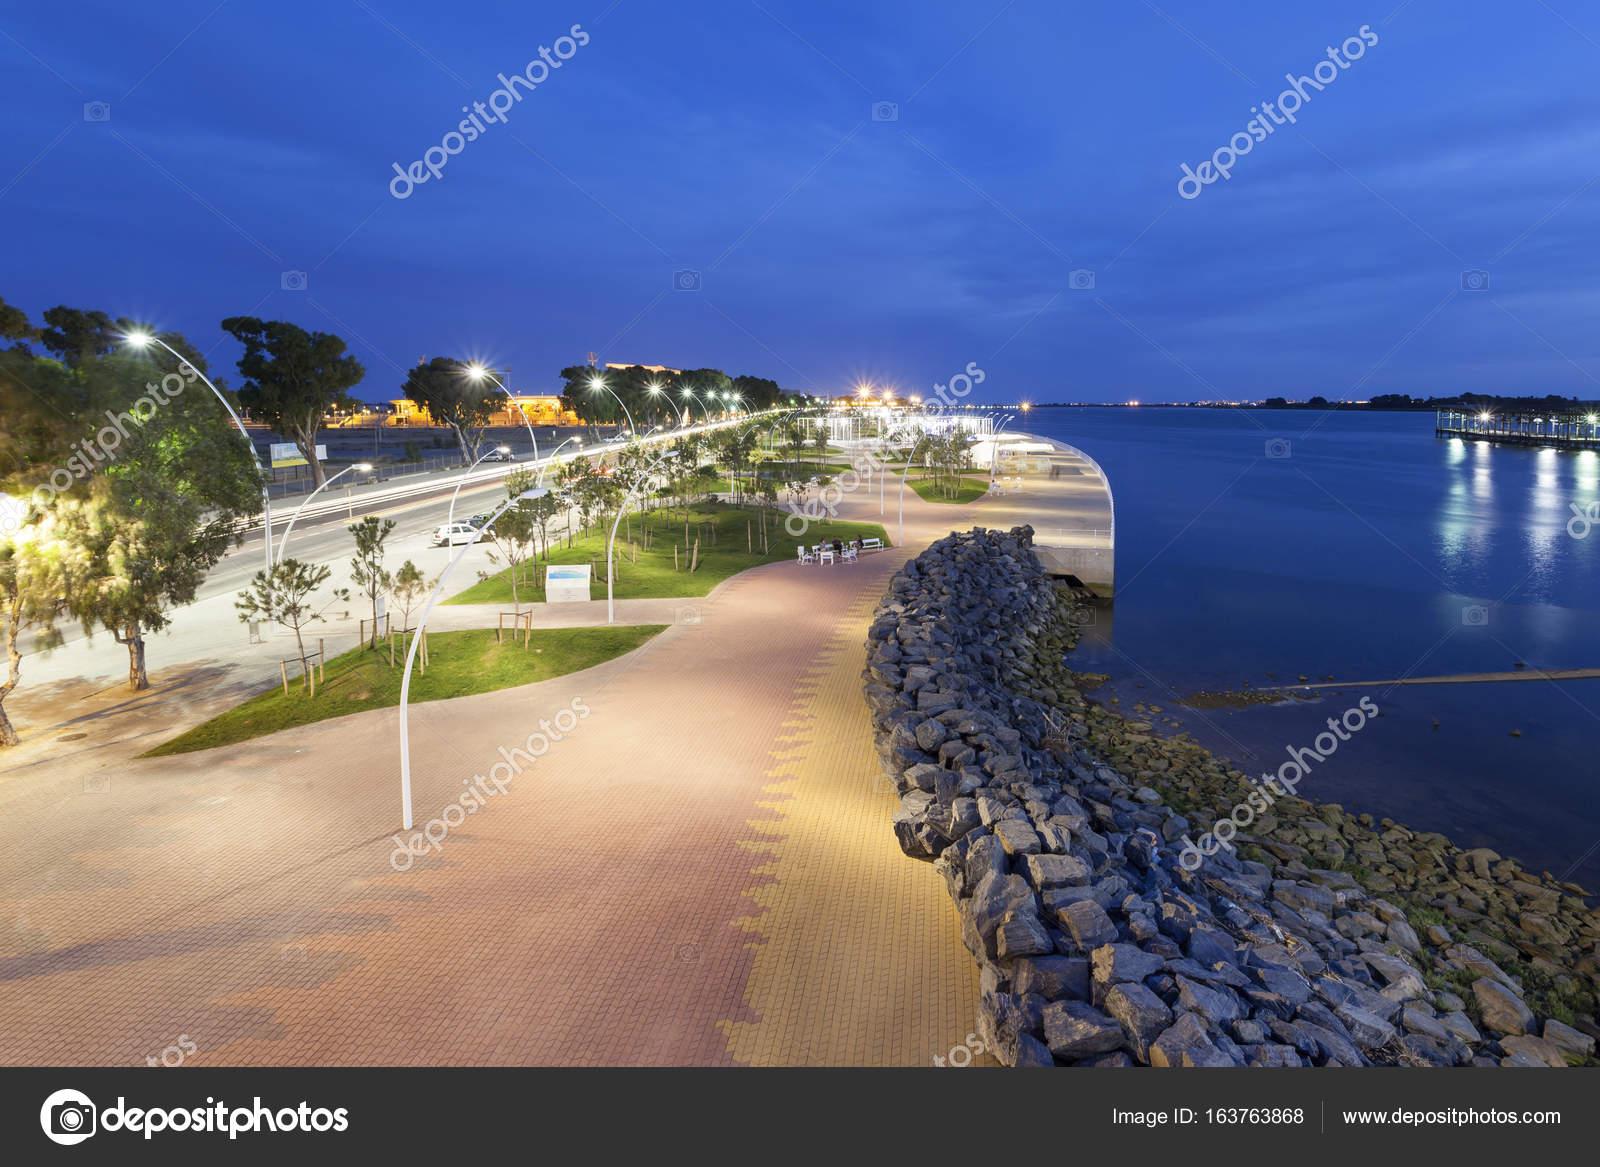 Salas de Huelva